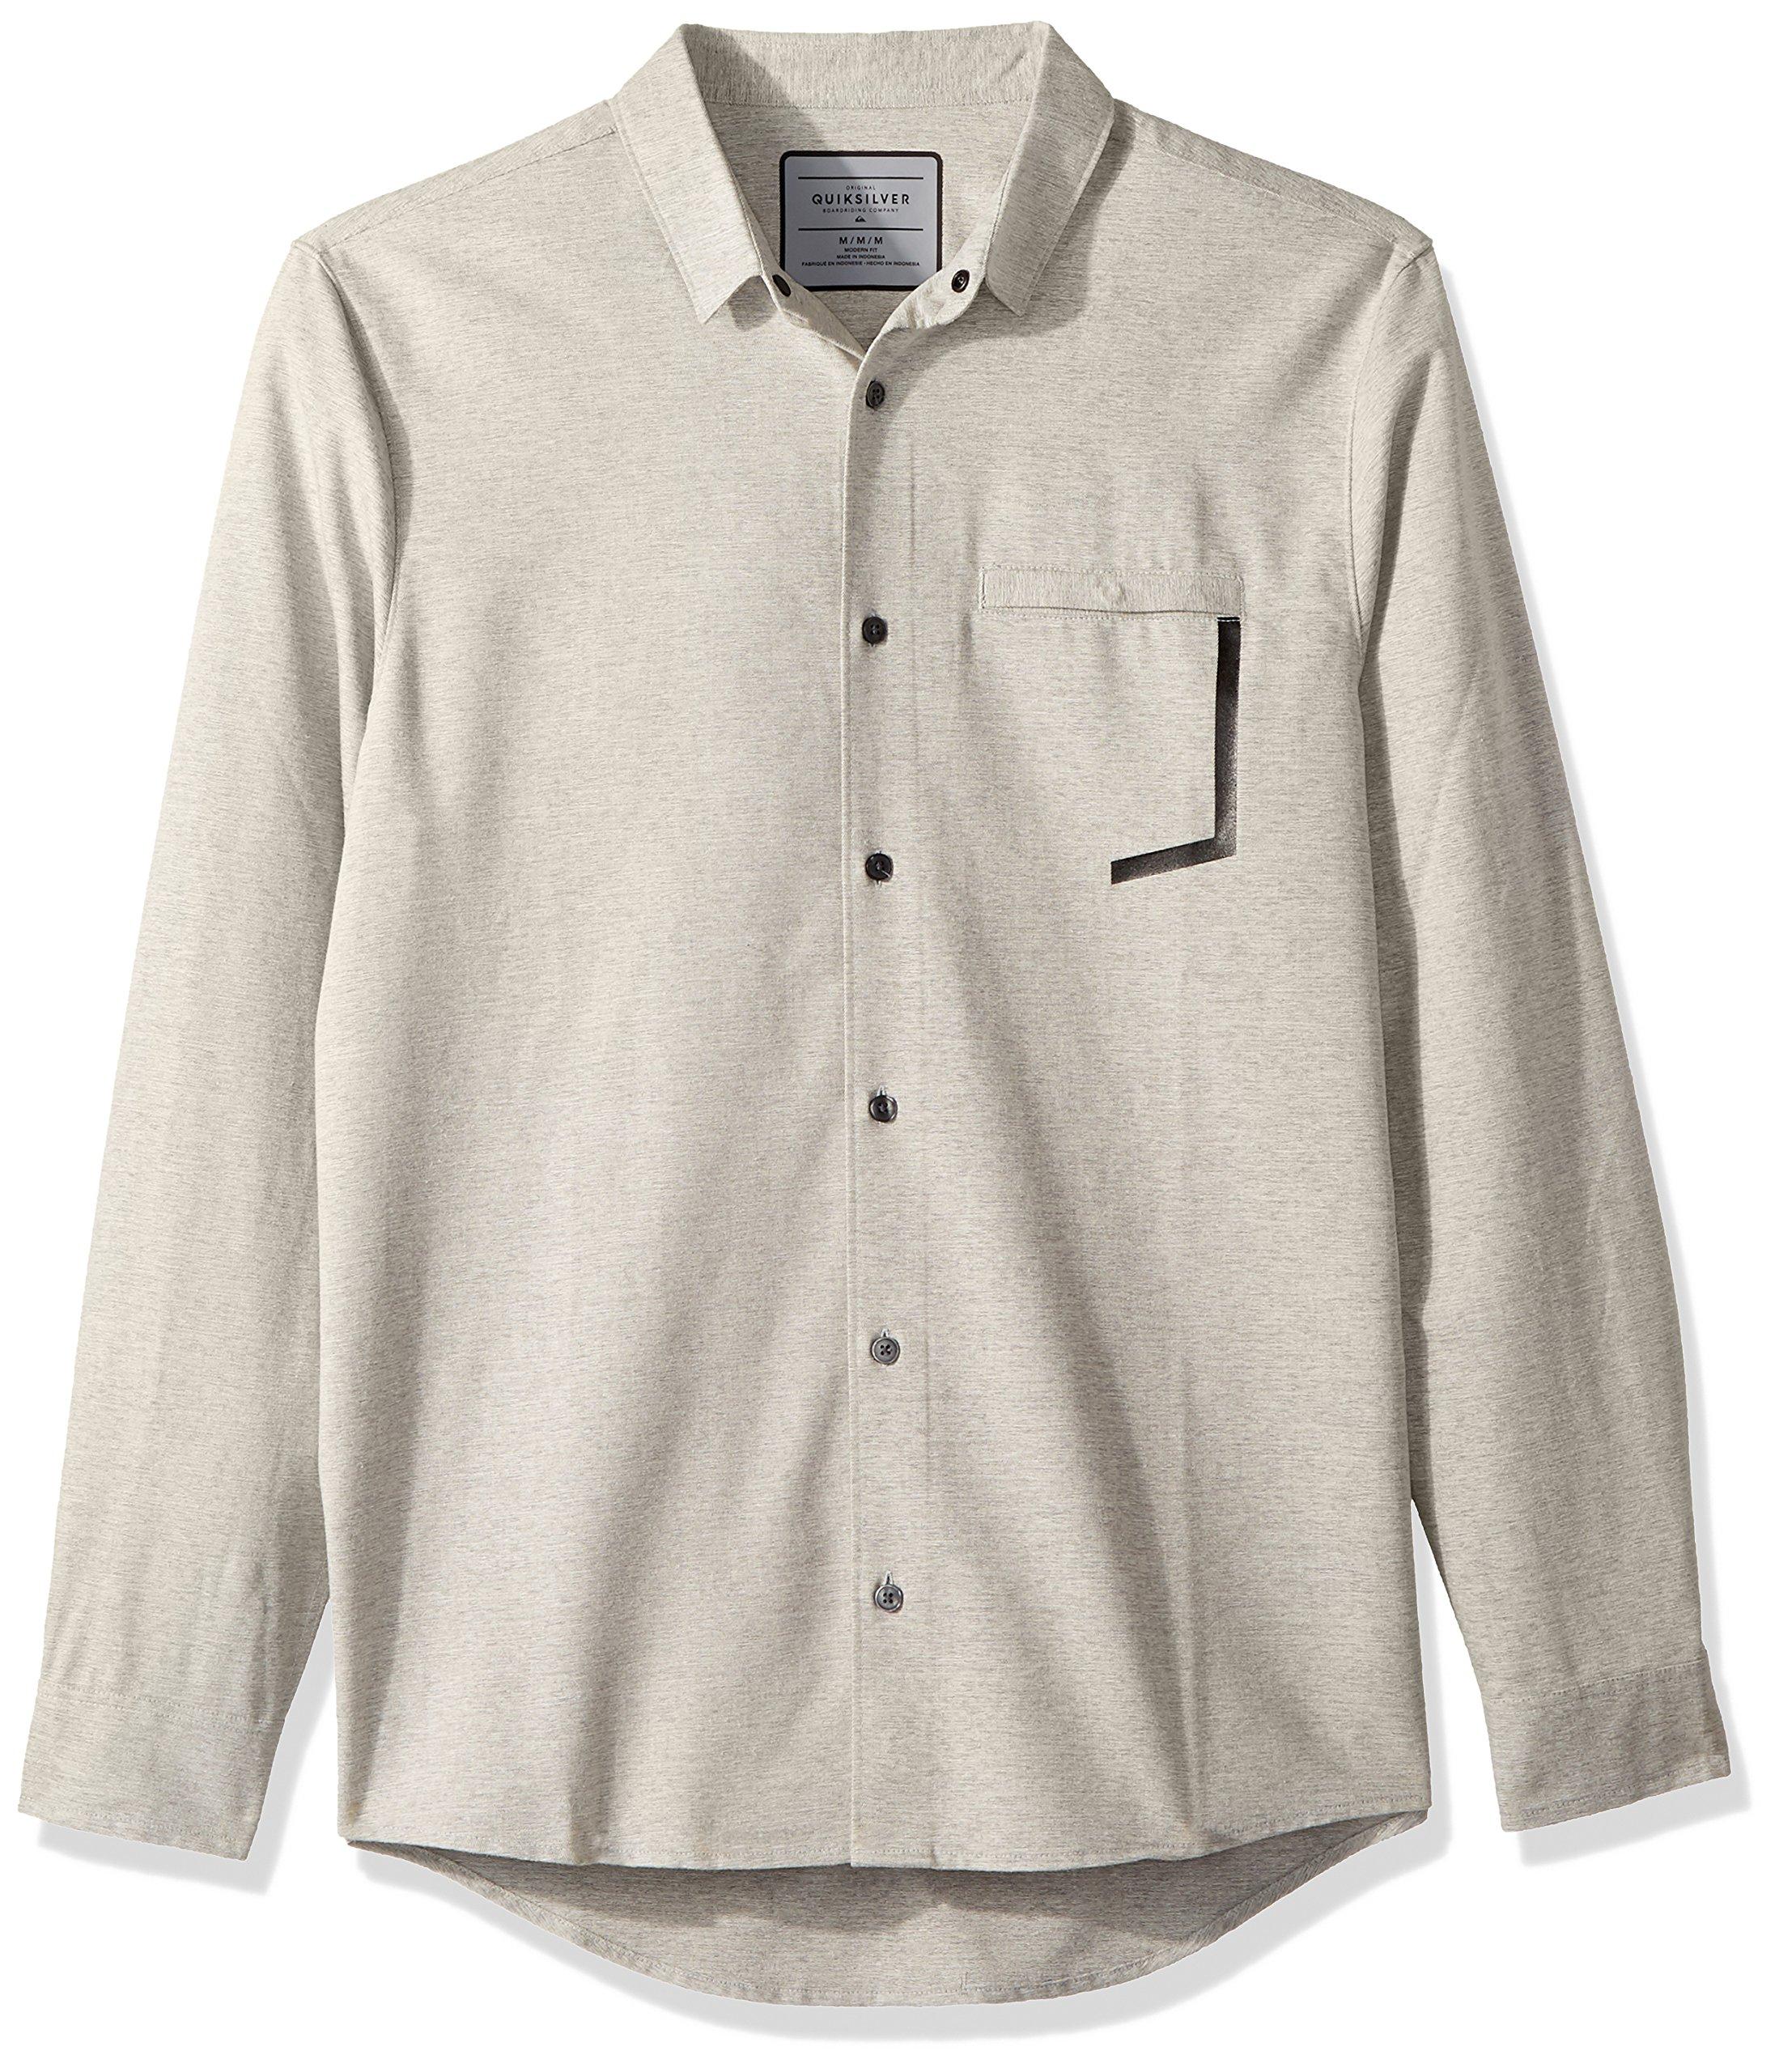 Quiksilver Men's Qtrvl Button Down Shirt, Light Grey Heather, M